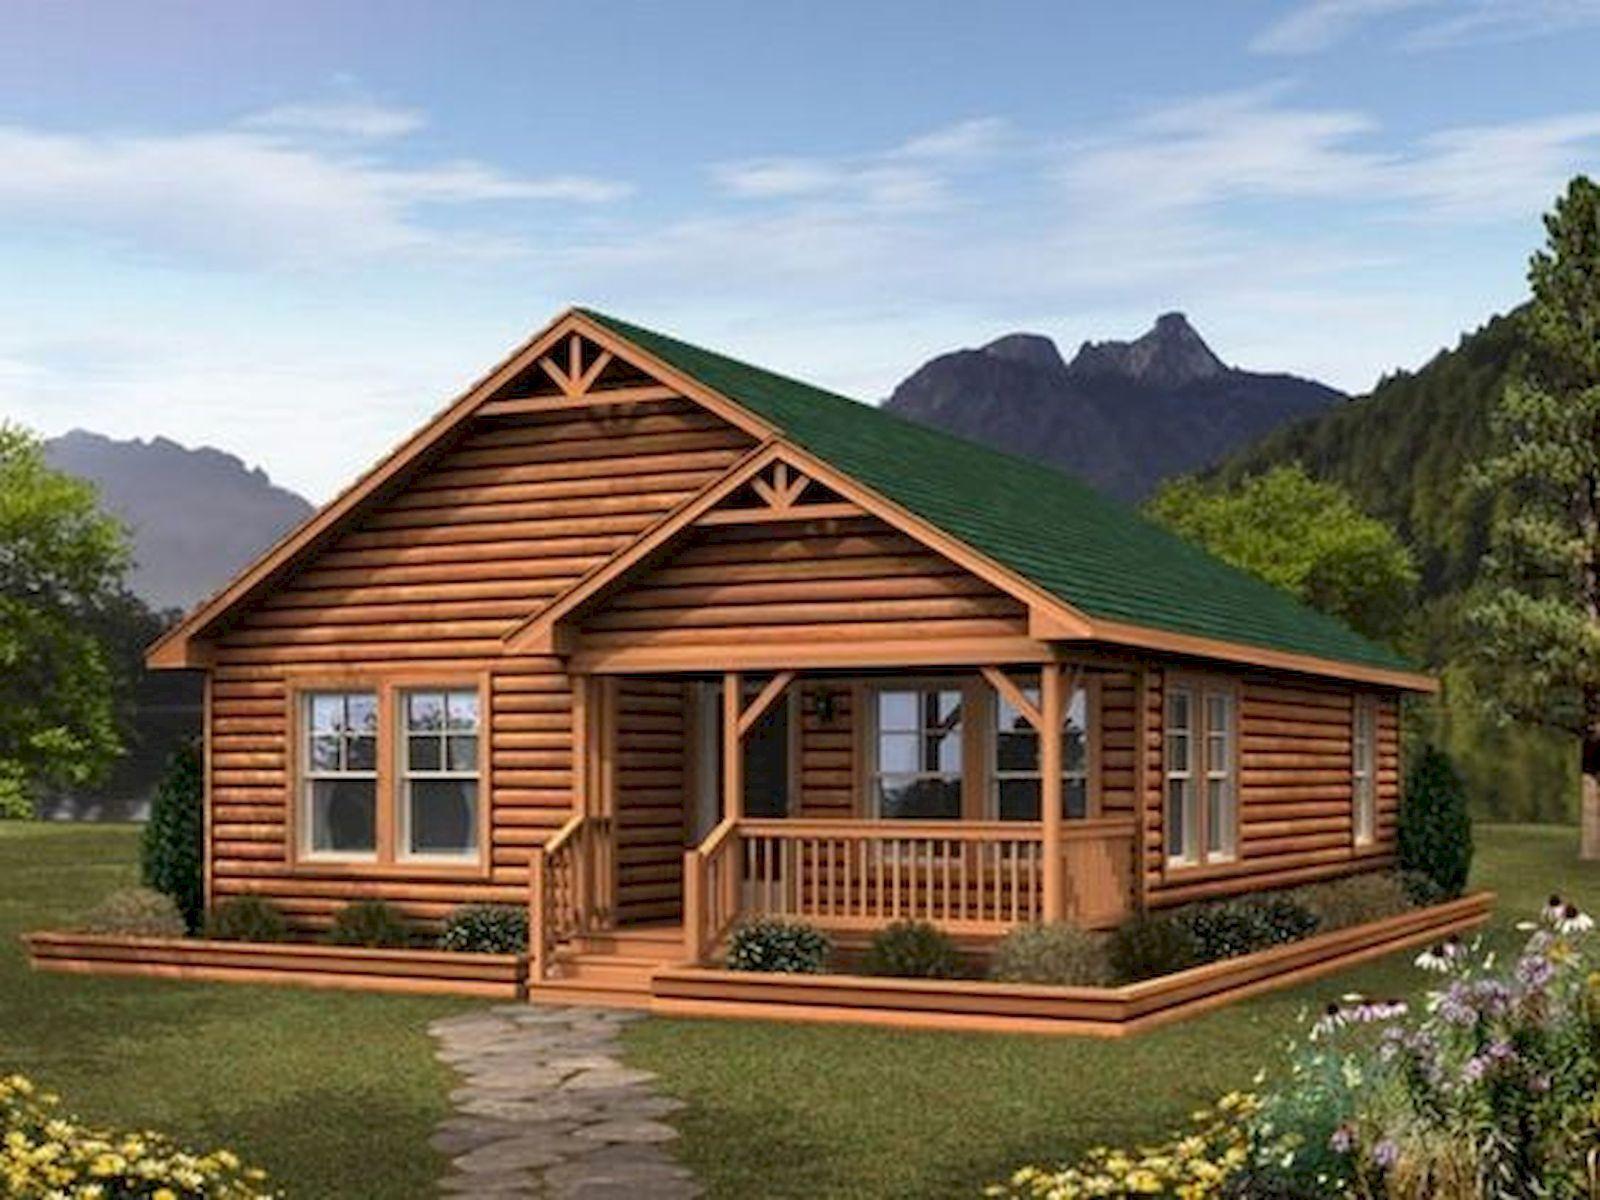 Nice 40 Stunning Log Cabin Homes Plans One Story Design Ideas Https Livingmarch Com 40 Stunning Log Log Cabin Modular Homes Prefab Log Homes Small Log Cabin